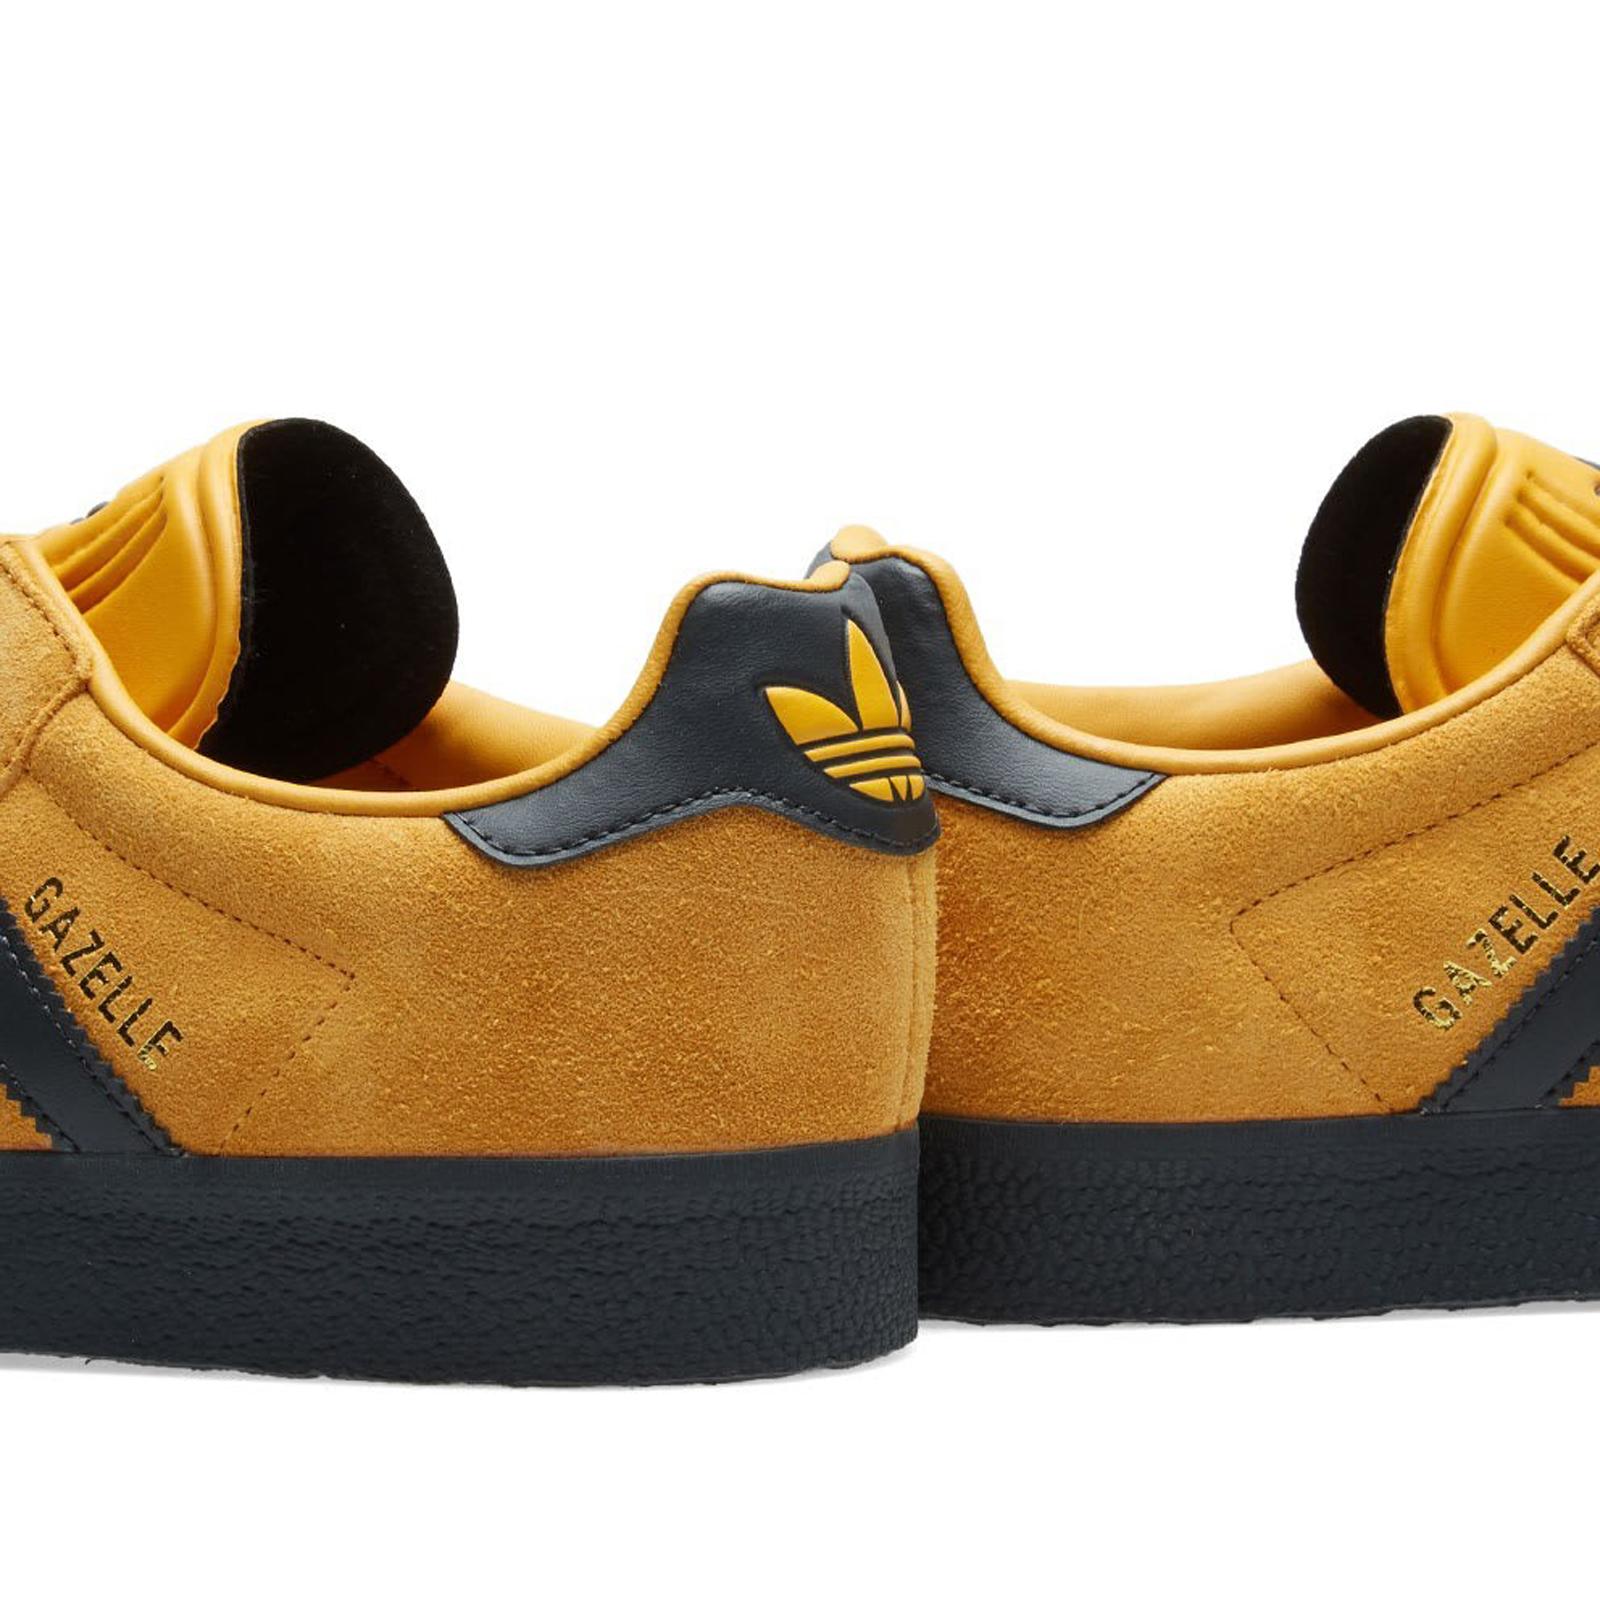 adidas gazelle amarillo negro